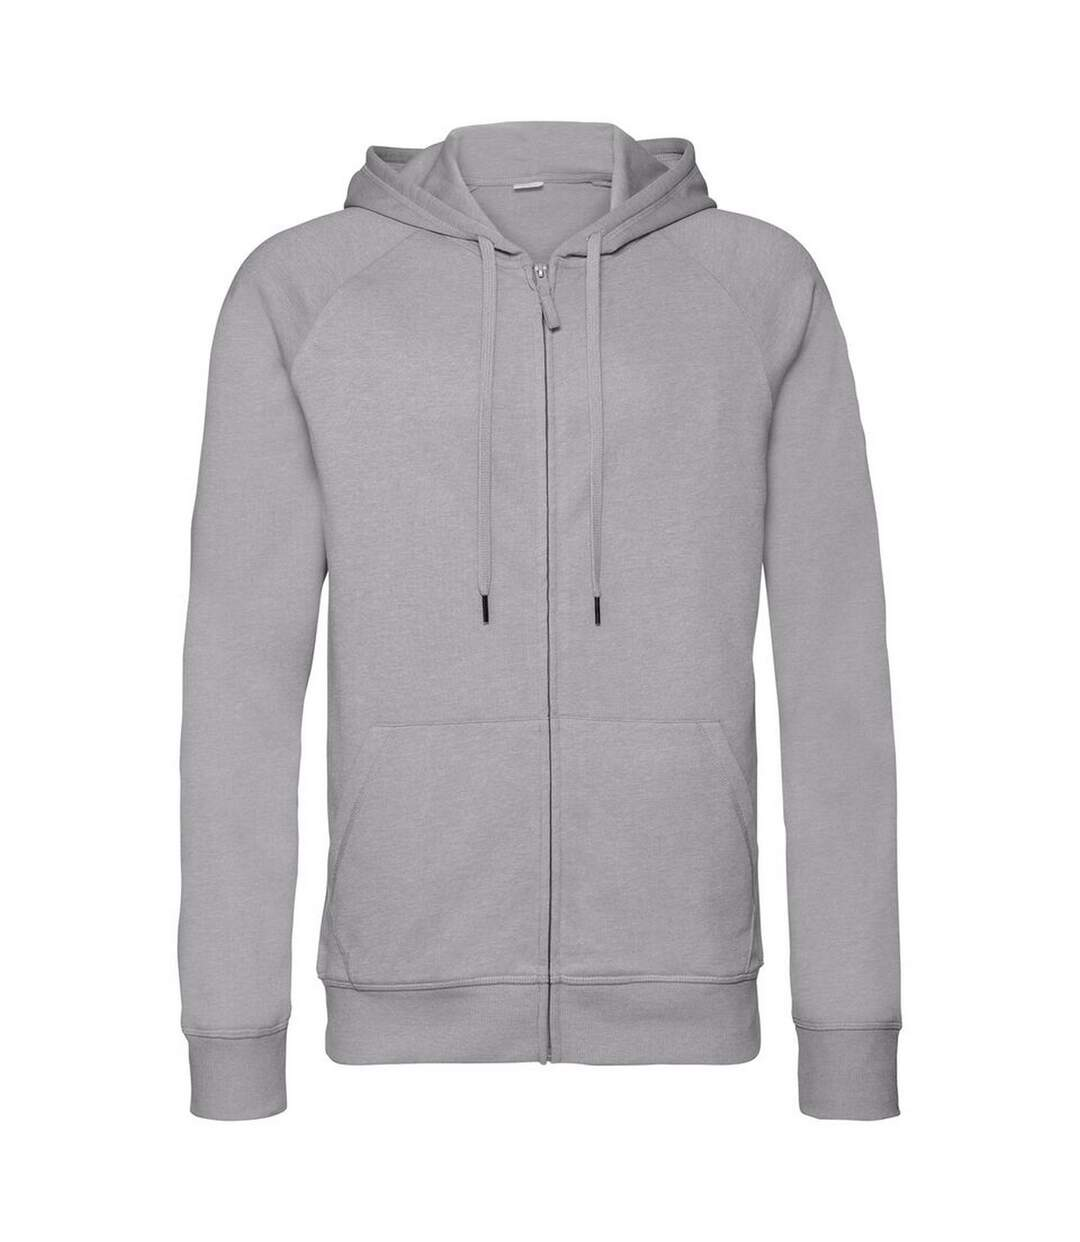 Russell Mens HD Zipped Hood Sweatshirt (Silver Marl) - UTRW6076